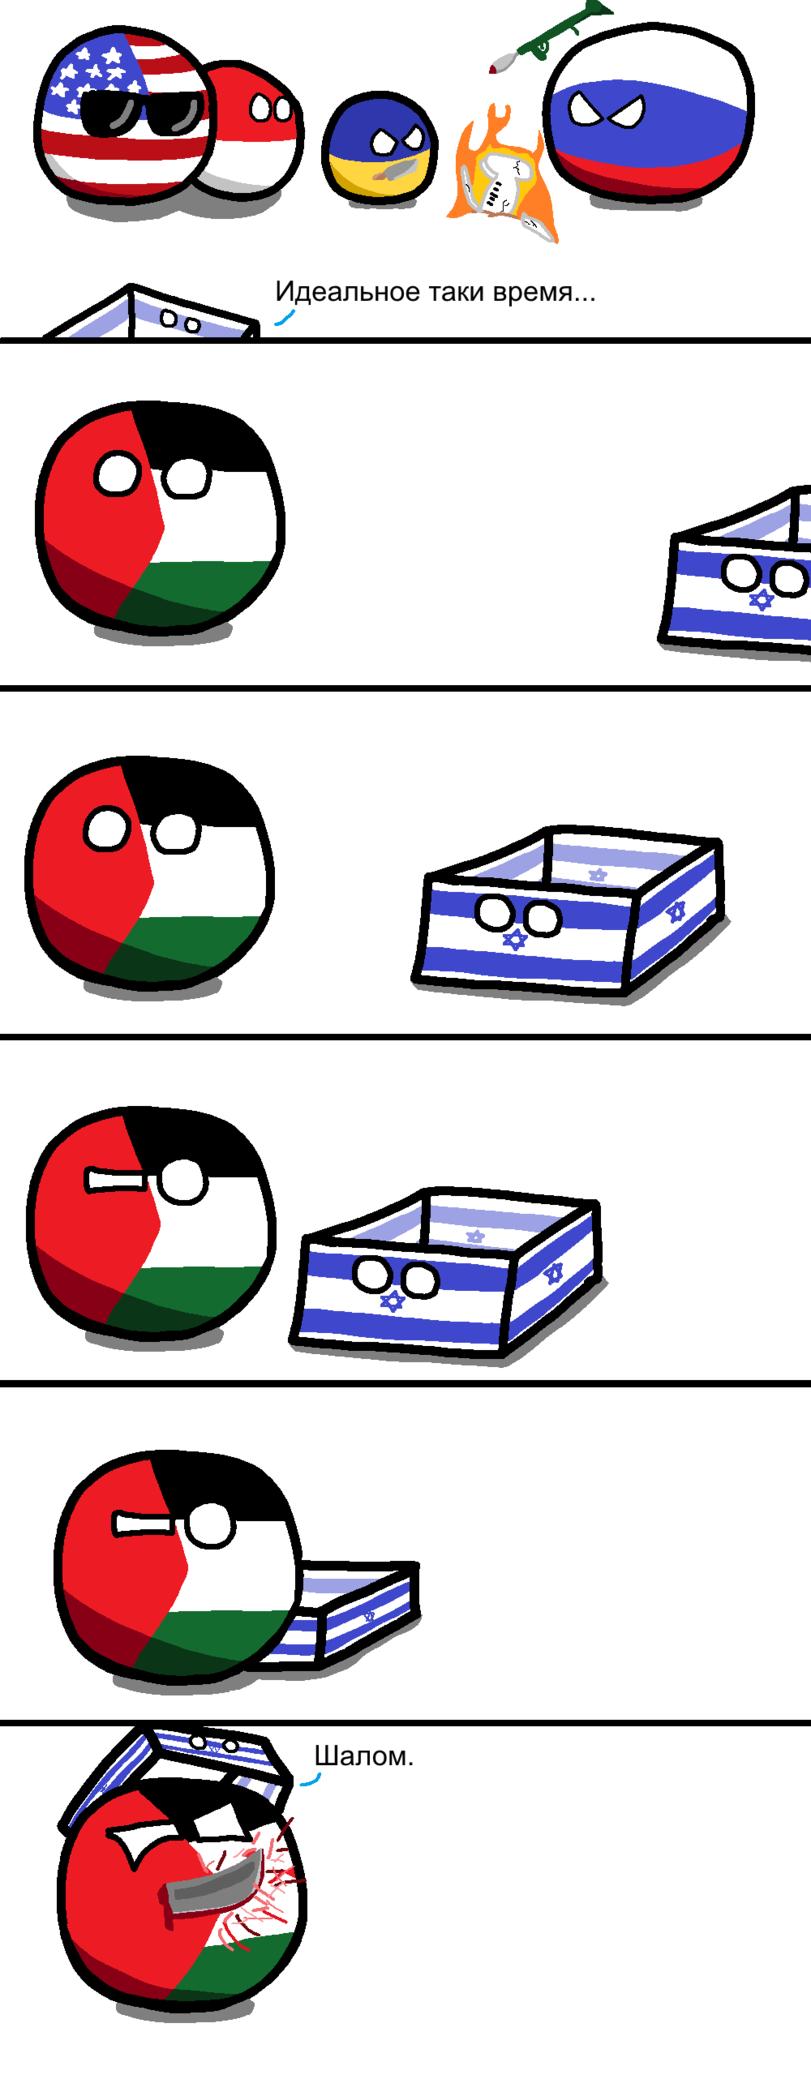 countryballs-Израиль